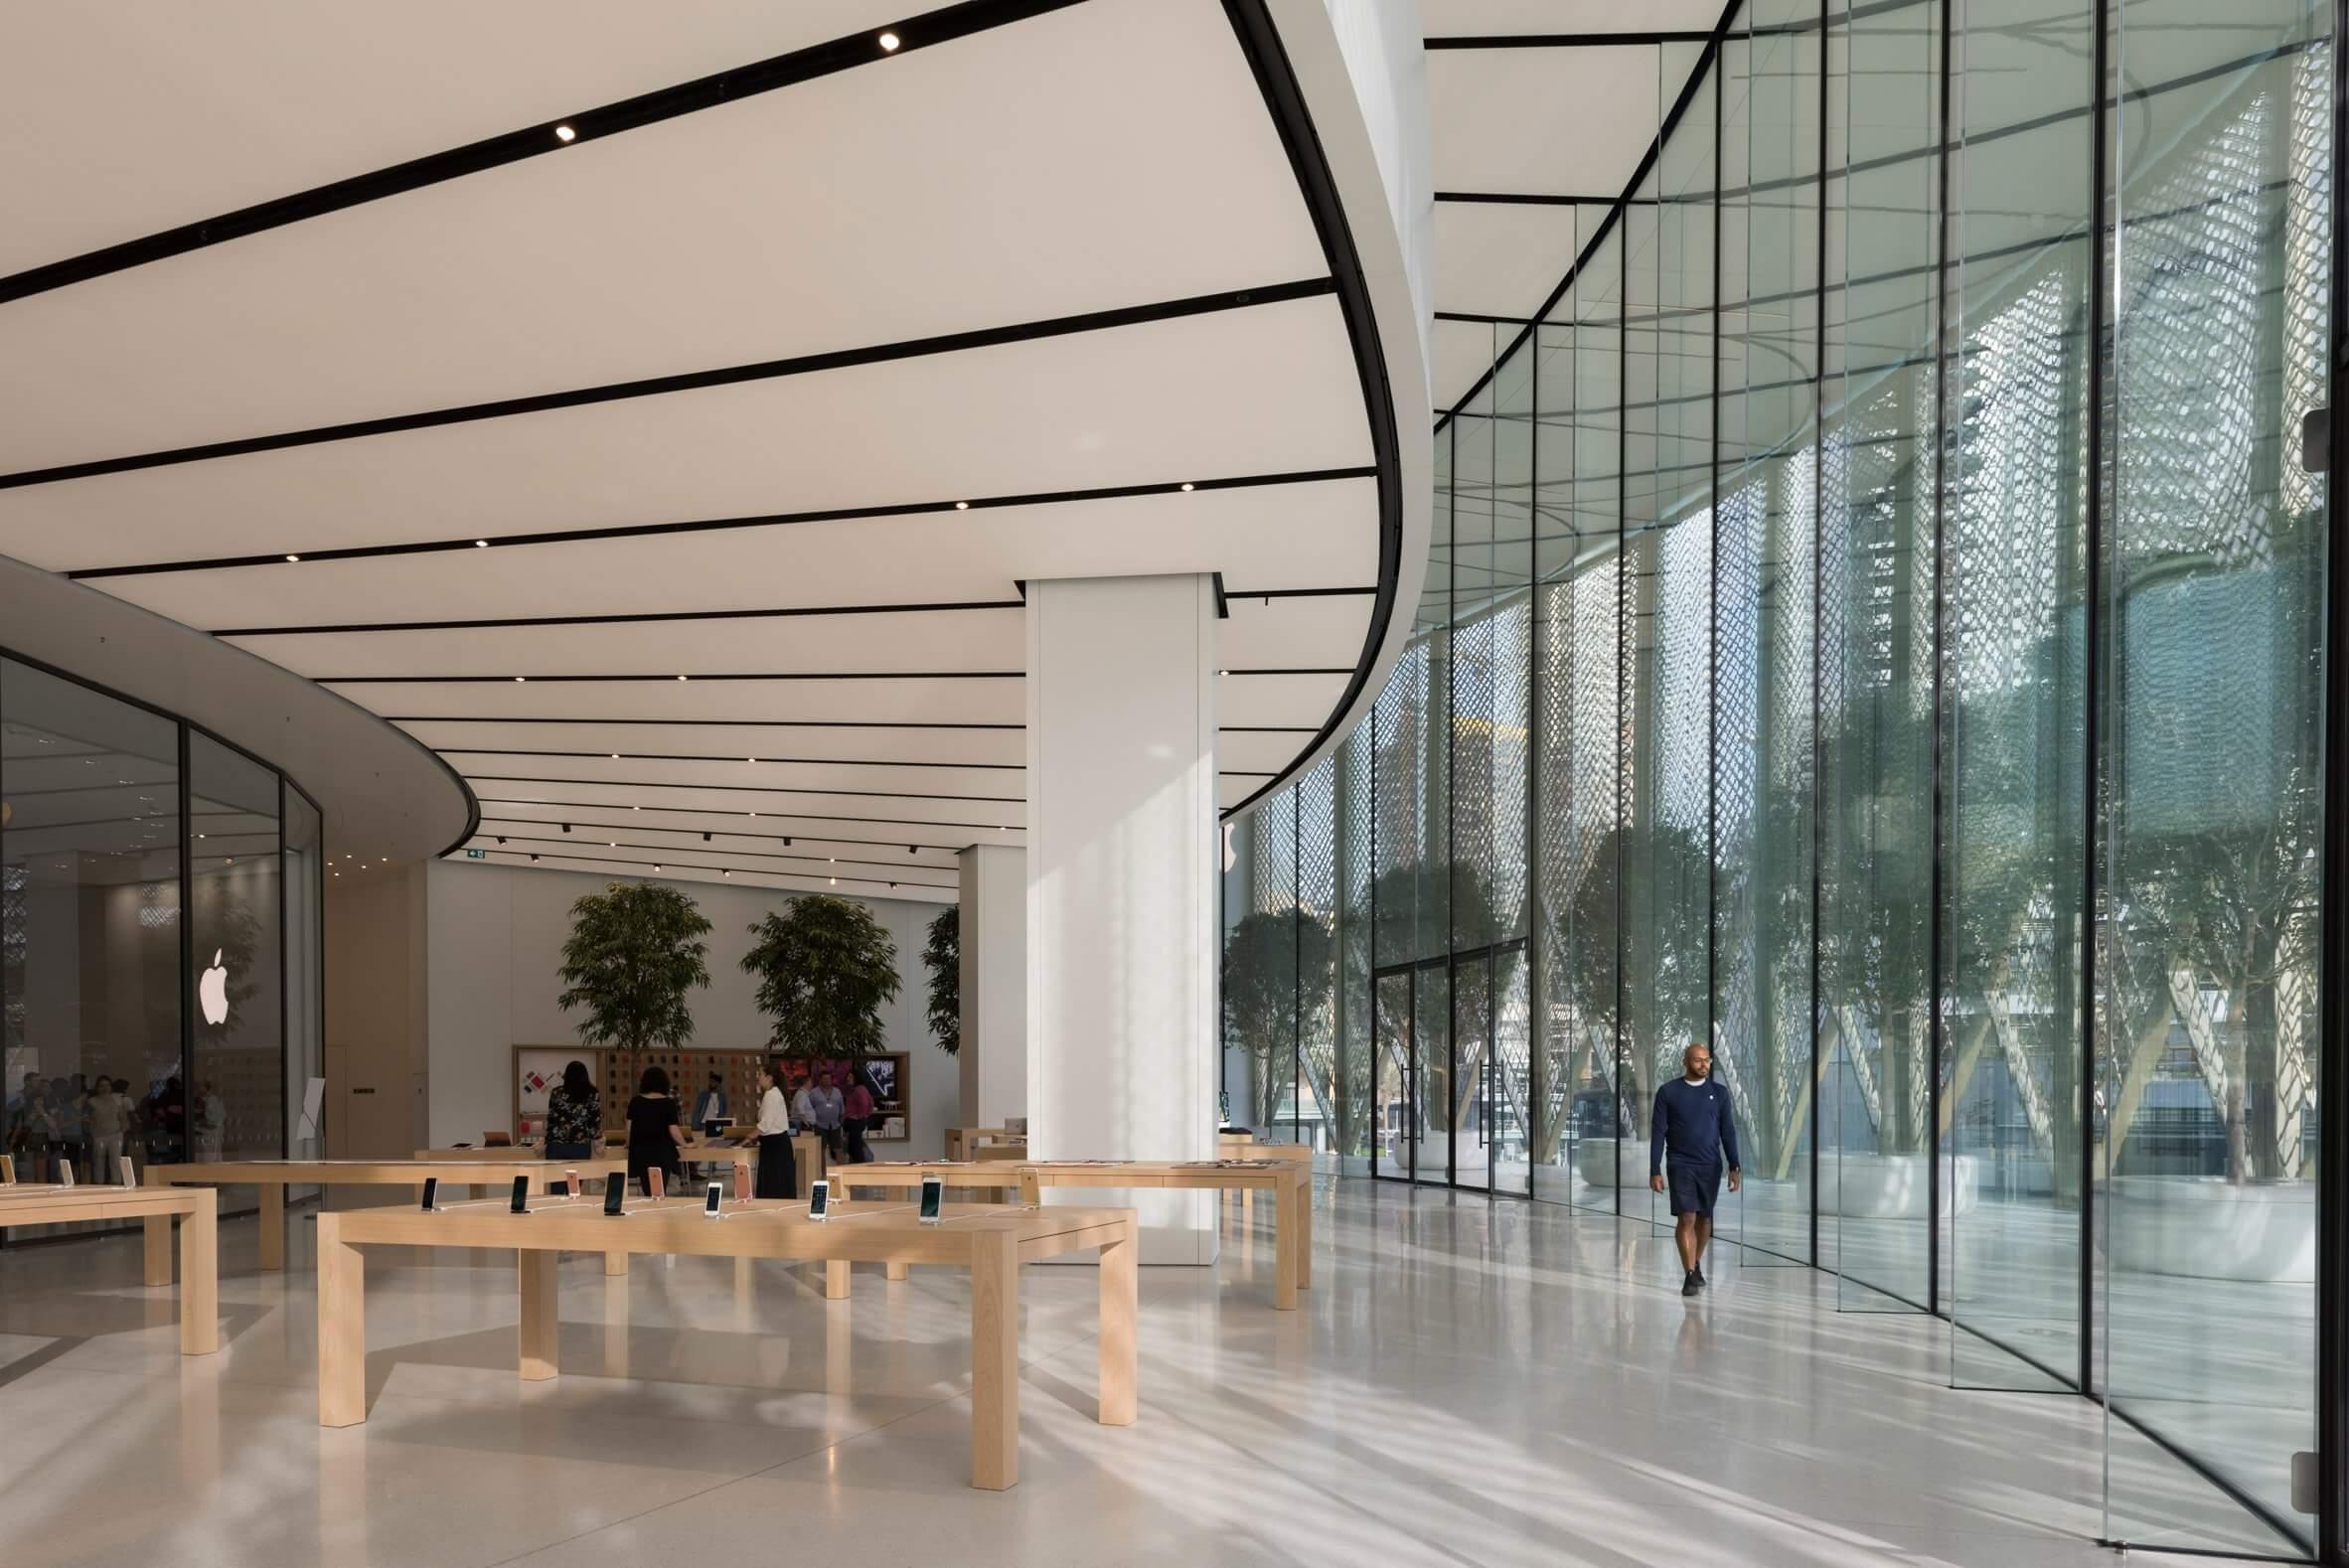 apple-dubai-mall-foster-partners-architecture-retail-uae_dezeen_2364_col_2